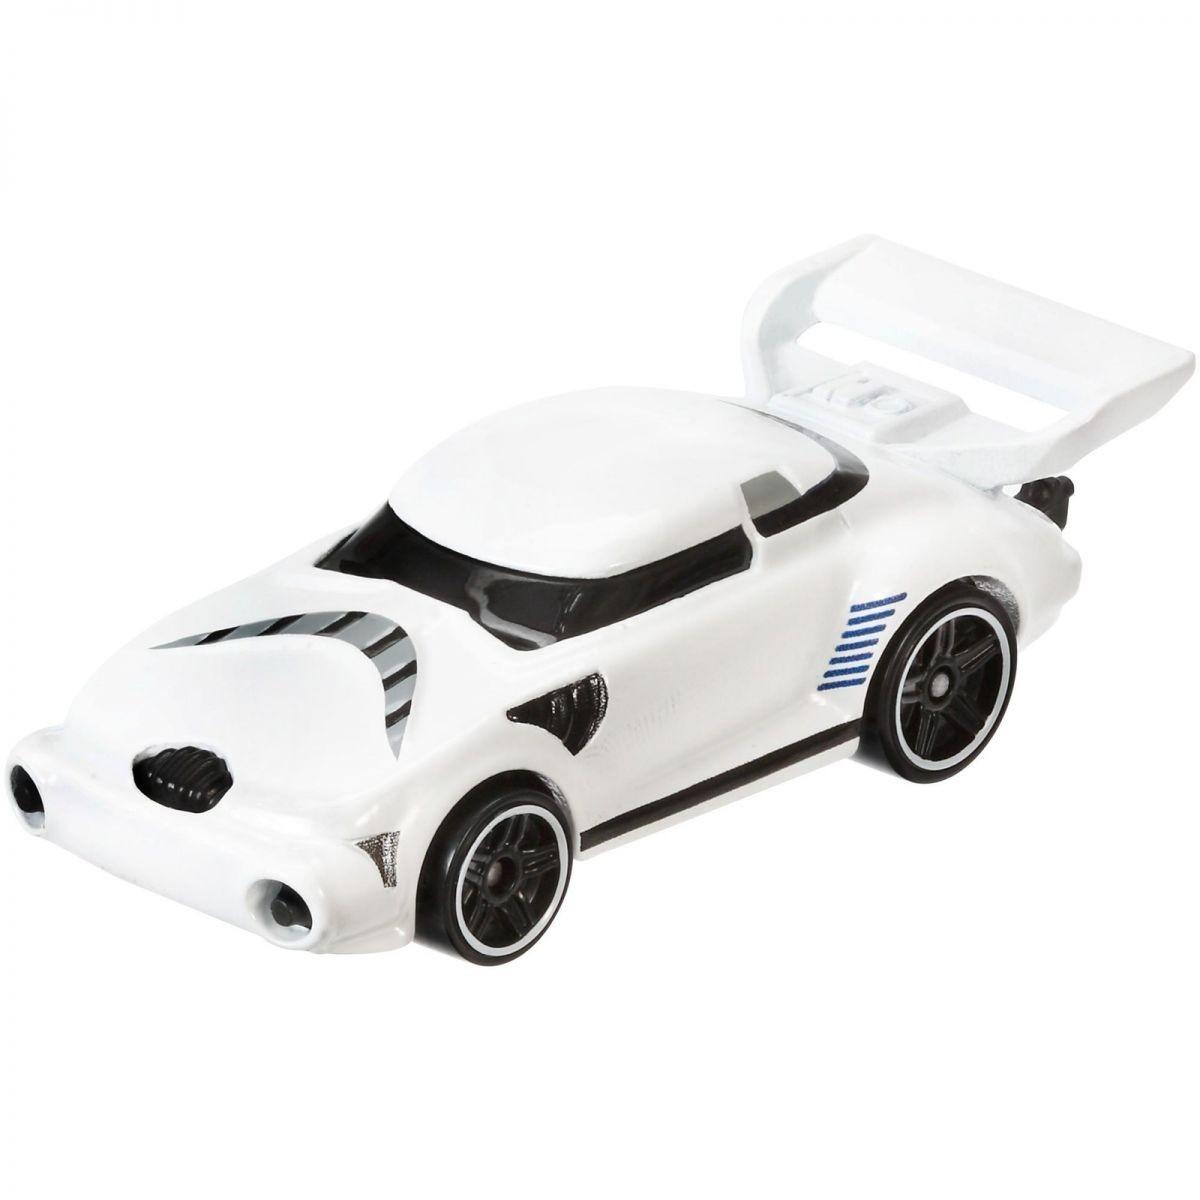 Star Wars: Stormtrooper - Hot Wheels